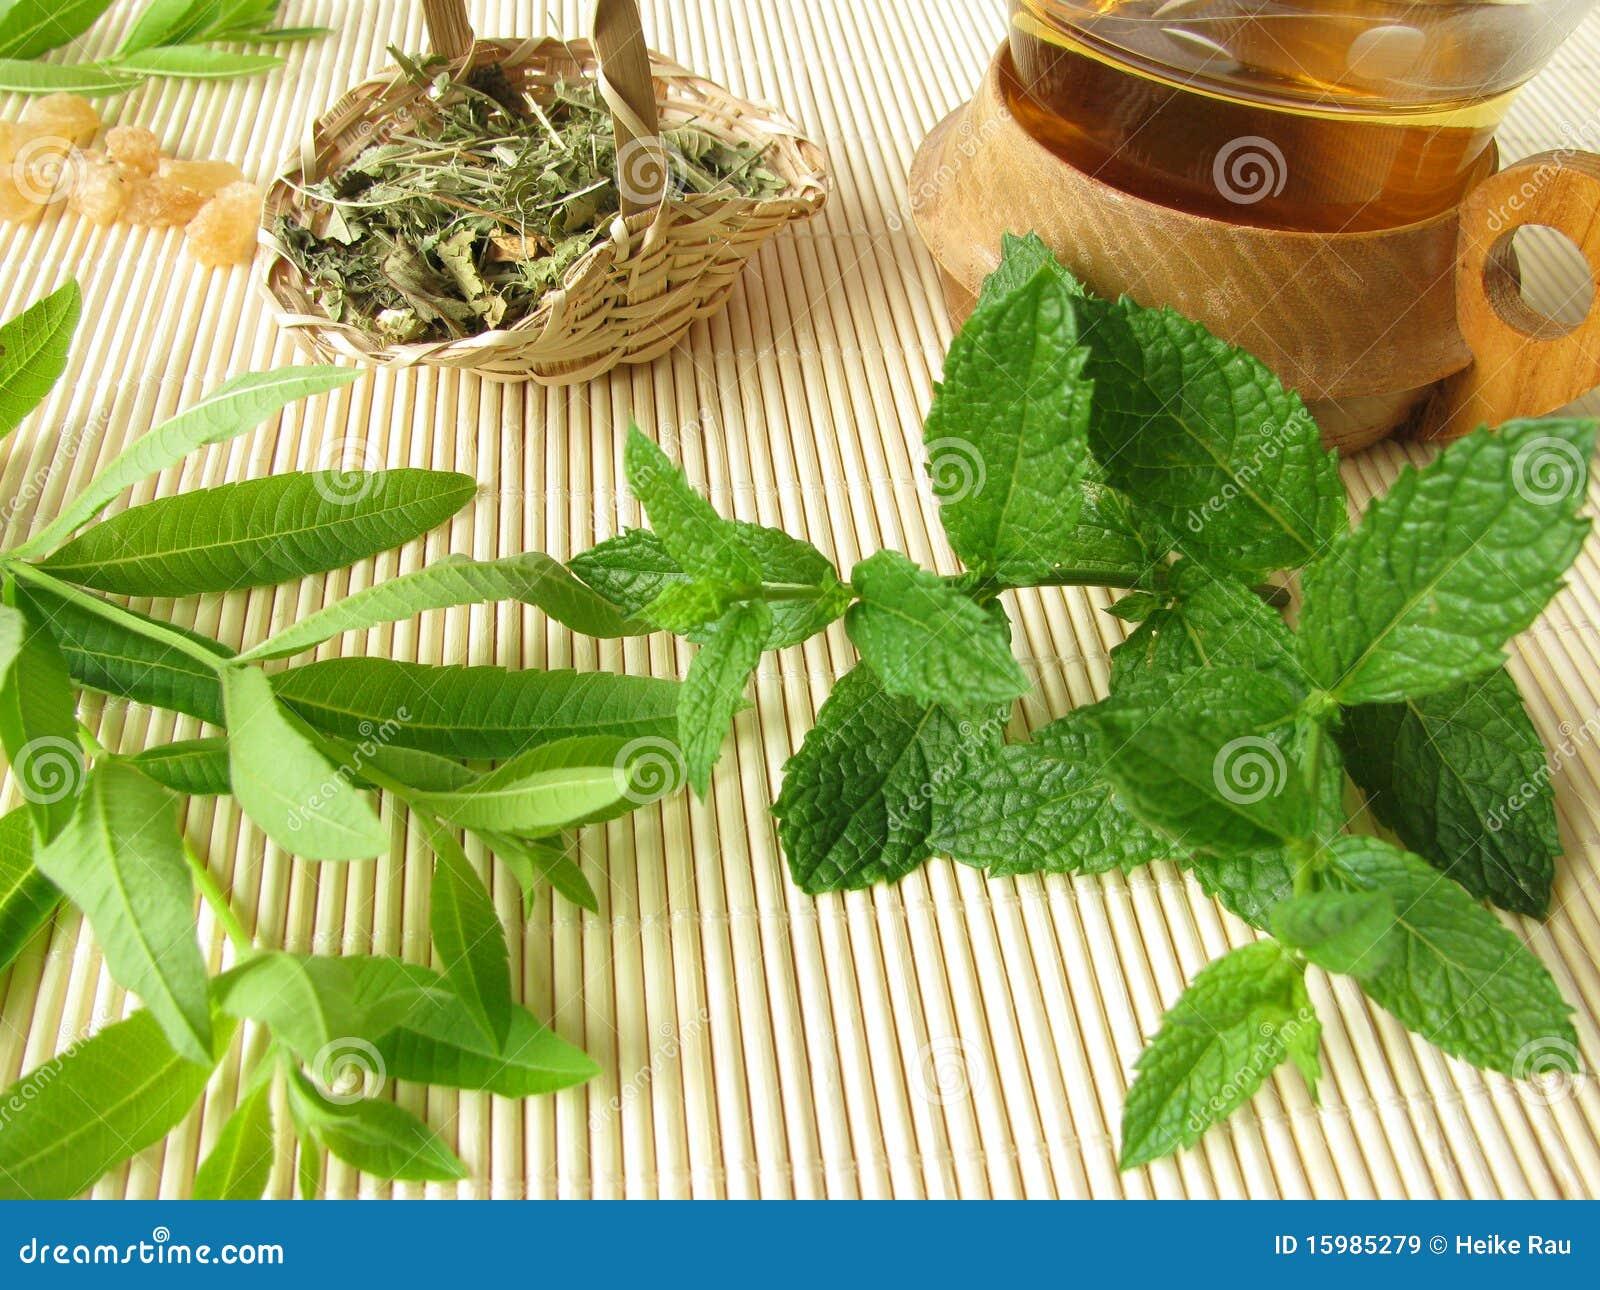 Herbal Tea With Lemon Verbena And Moroccan Mint Royalty ...